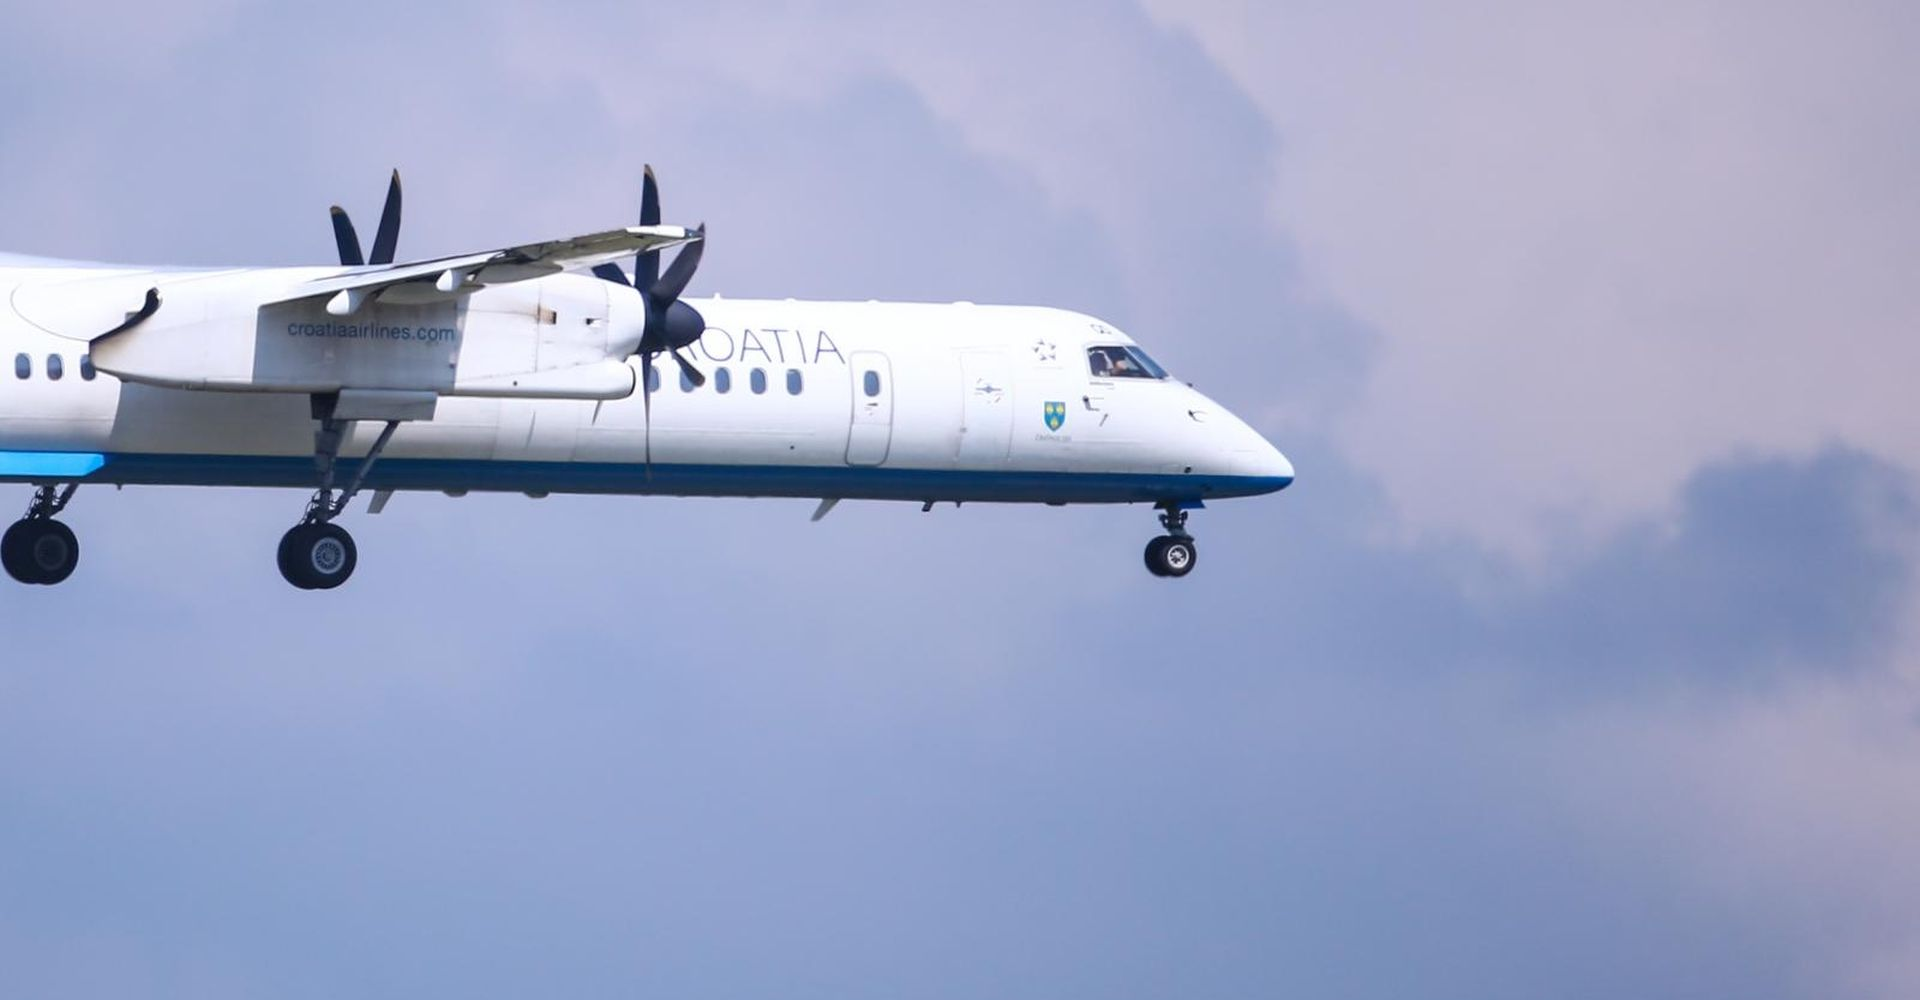 Croatia Airlines u 2018. godini prevezao rekordan broj putnika